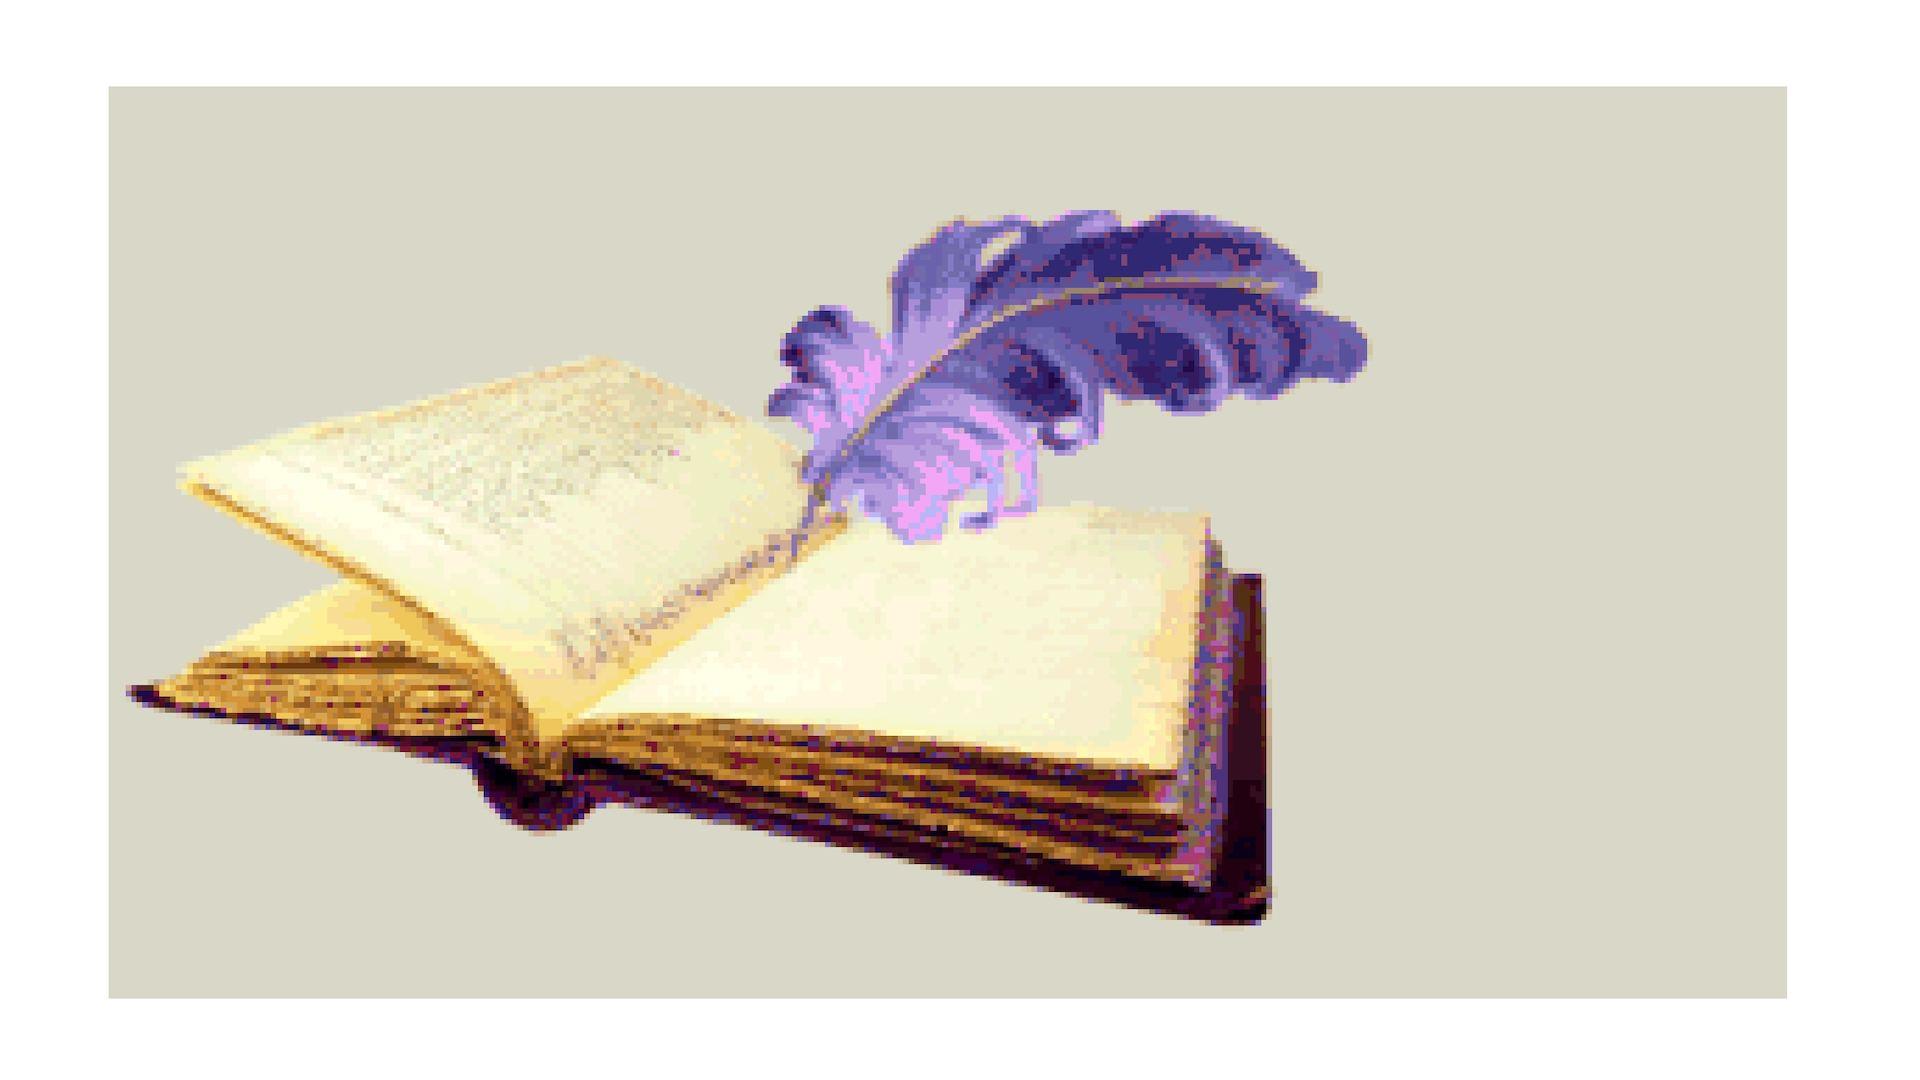 Наступающим, гифка книги без фона